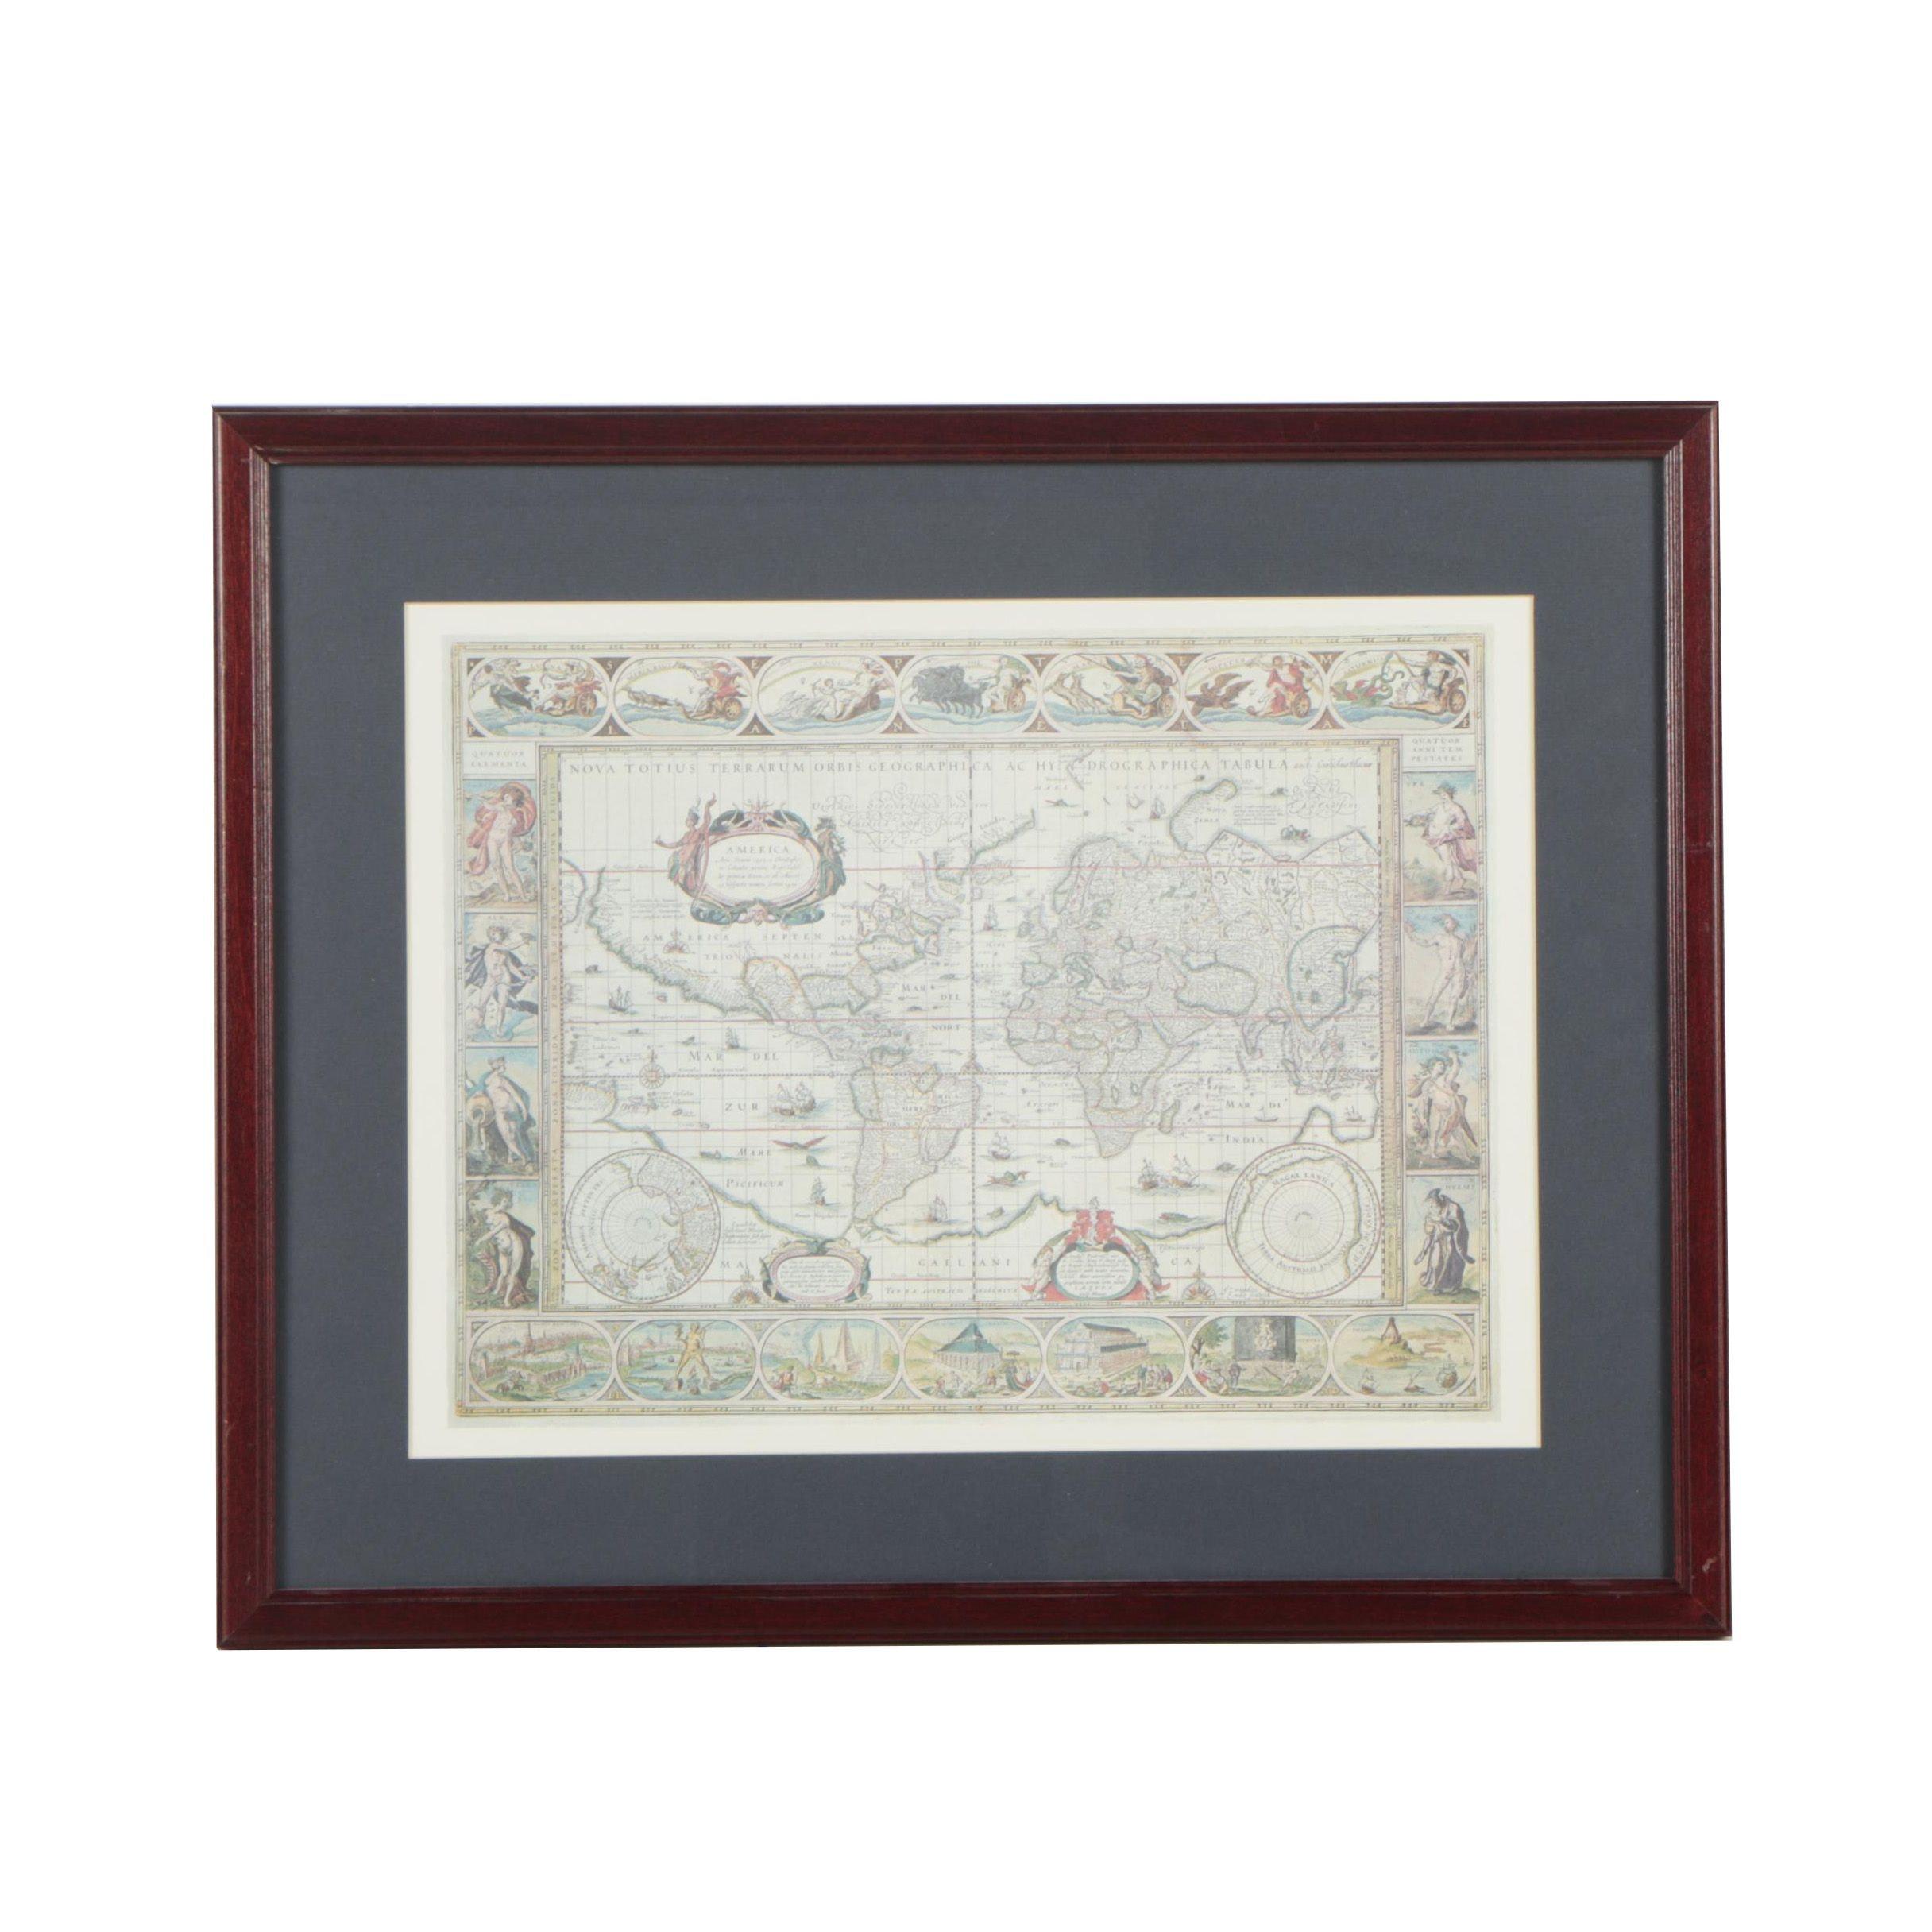 Offset Lithograph Reproduction Print After Willem Blaeu 1635 World Map